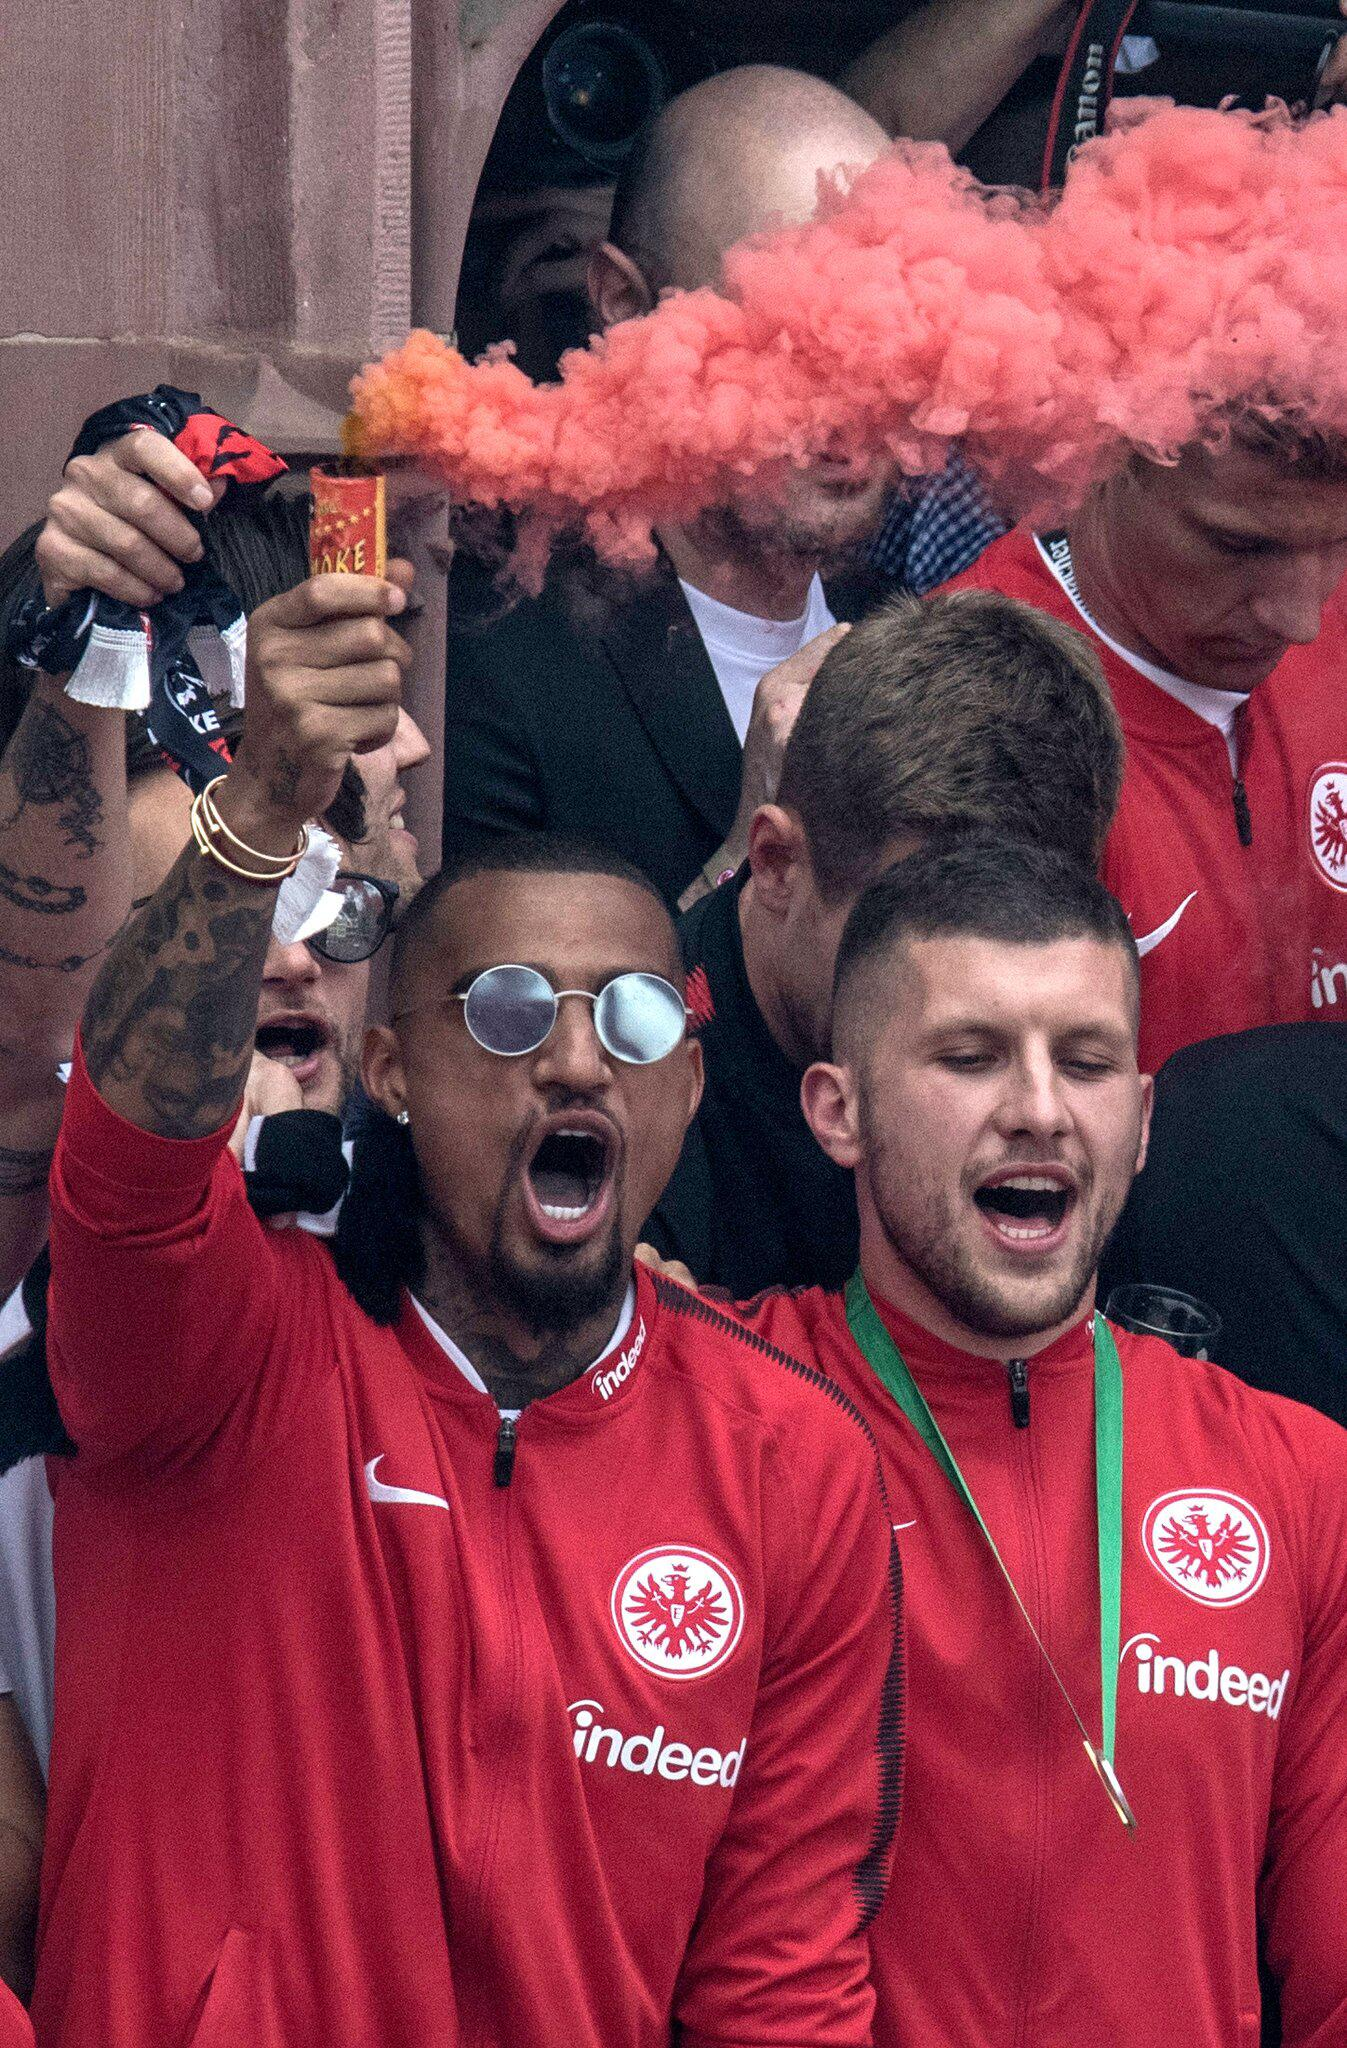 Bild zu DFB-Pokal Feier - Eintracht Frankfurt